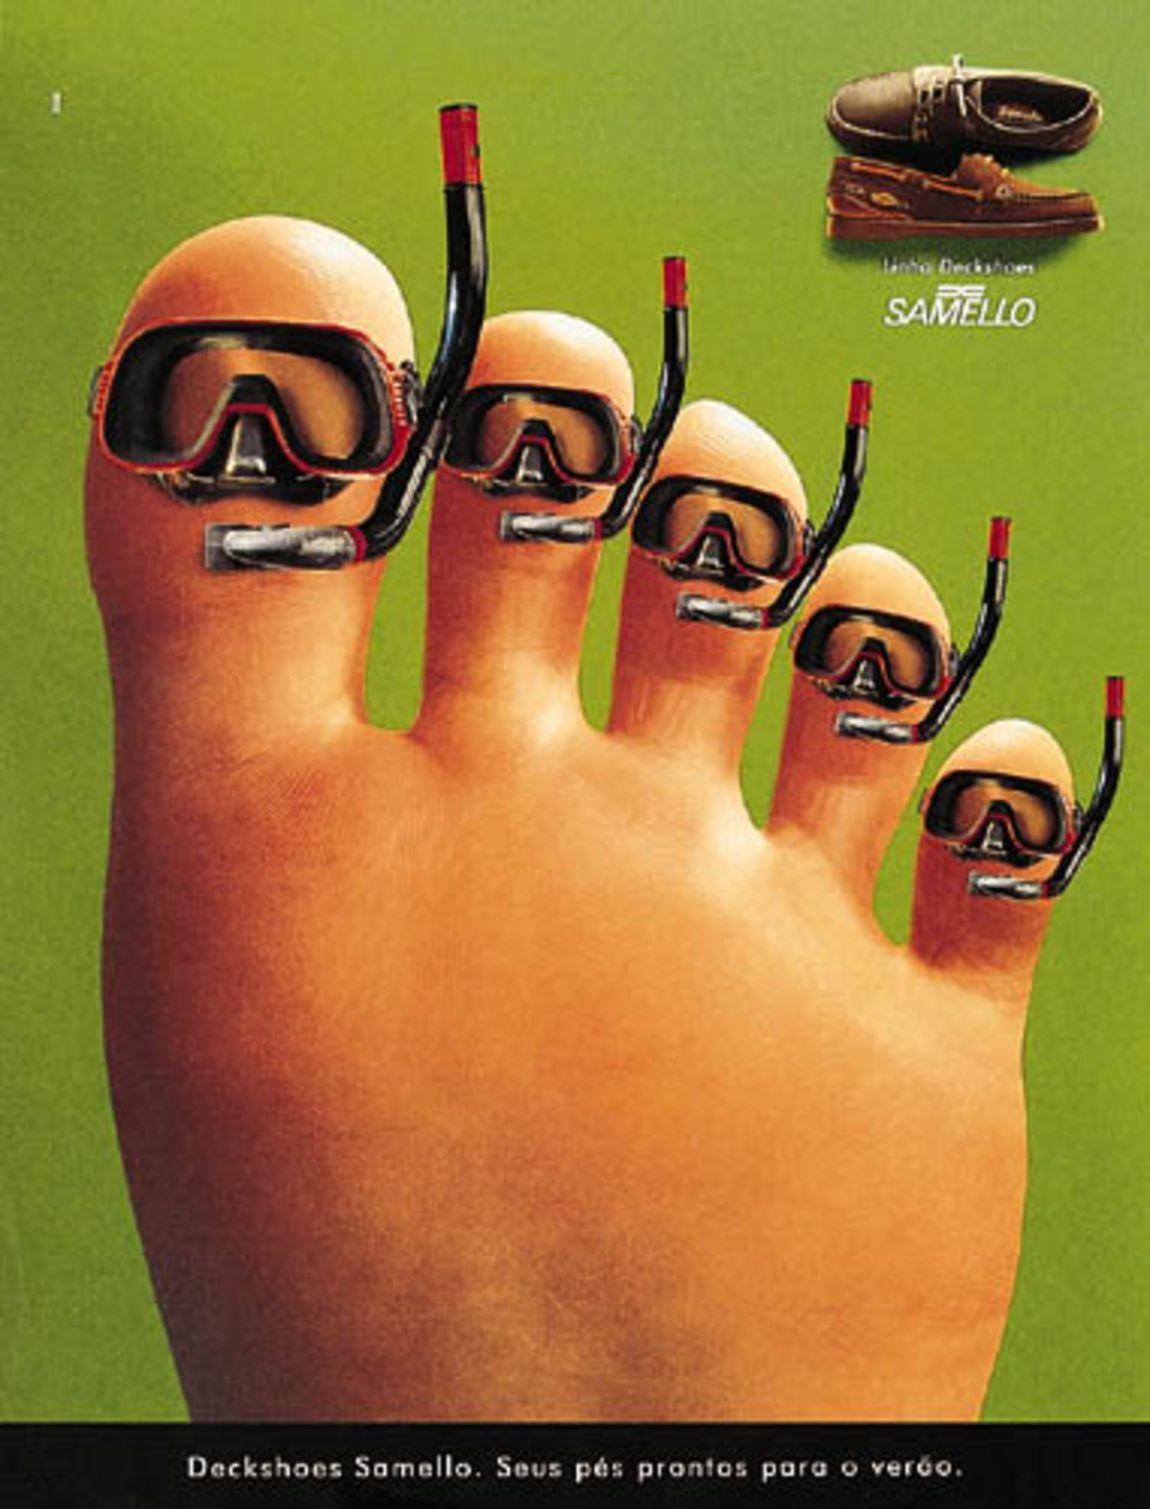 Read more: https://www.luerzersarchive.com/en/magazine/print-detail/3127.html Samello Deckshoes. Your feet are ready for summer. Tags: Jáder Rossetto,Fernando Zuffo,Samello,Pedro Cappeletti,DM9DDB, São Paulo